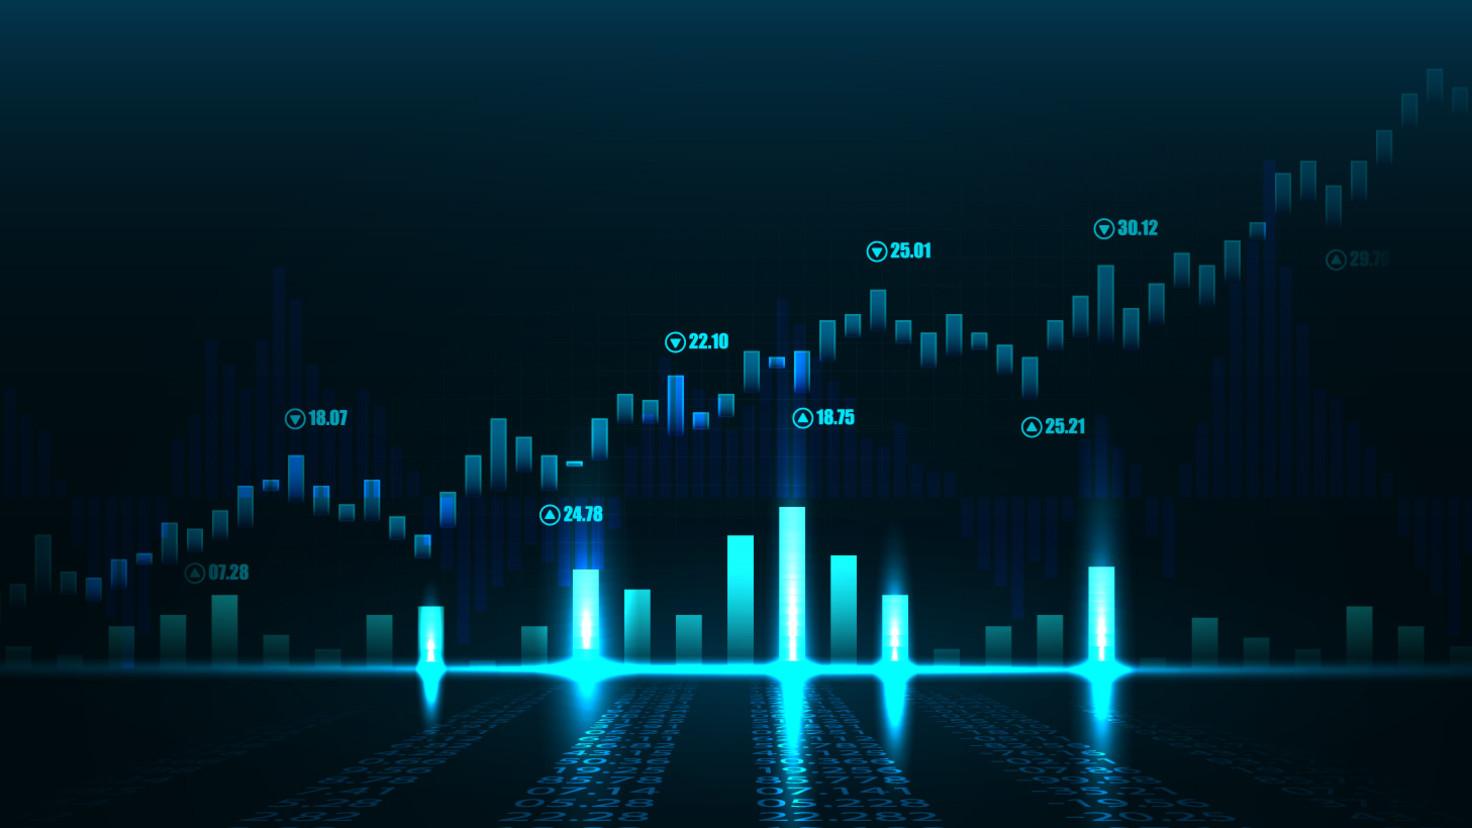 Three ways to make money with stock index investing